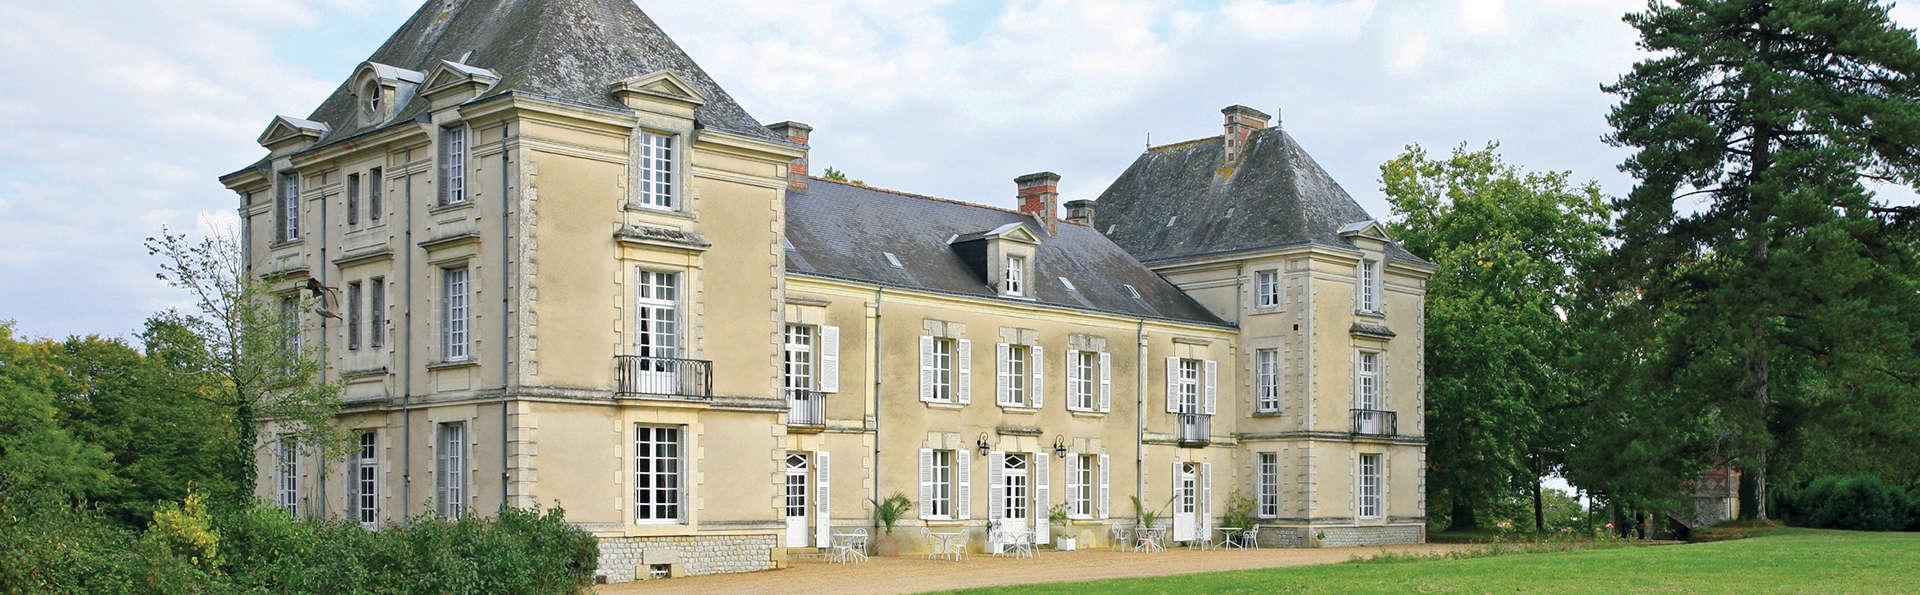 Château de Cop-Choux - EDIT_fachada_1.jpg